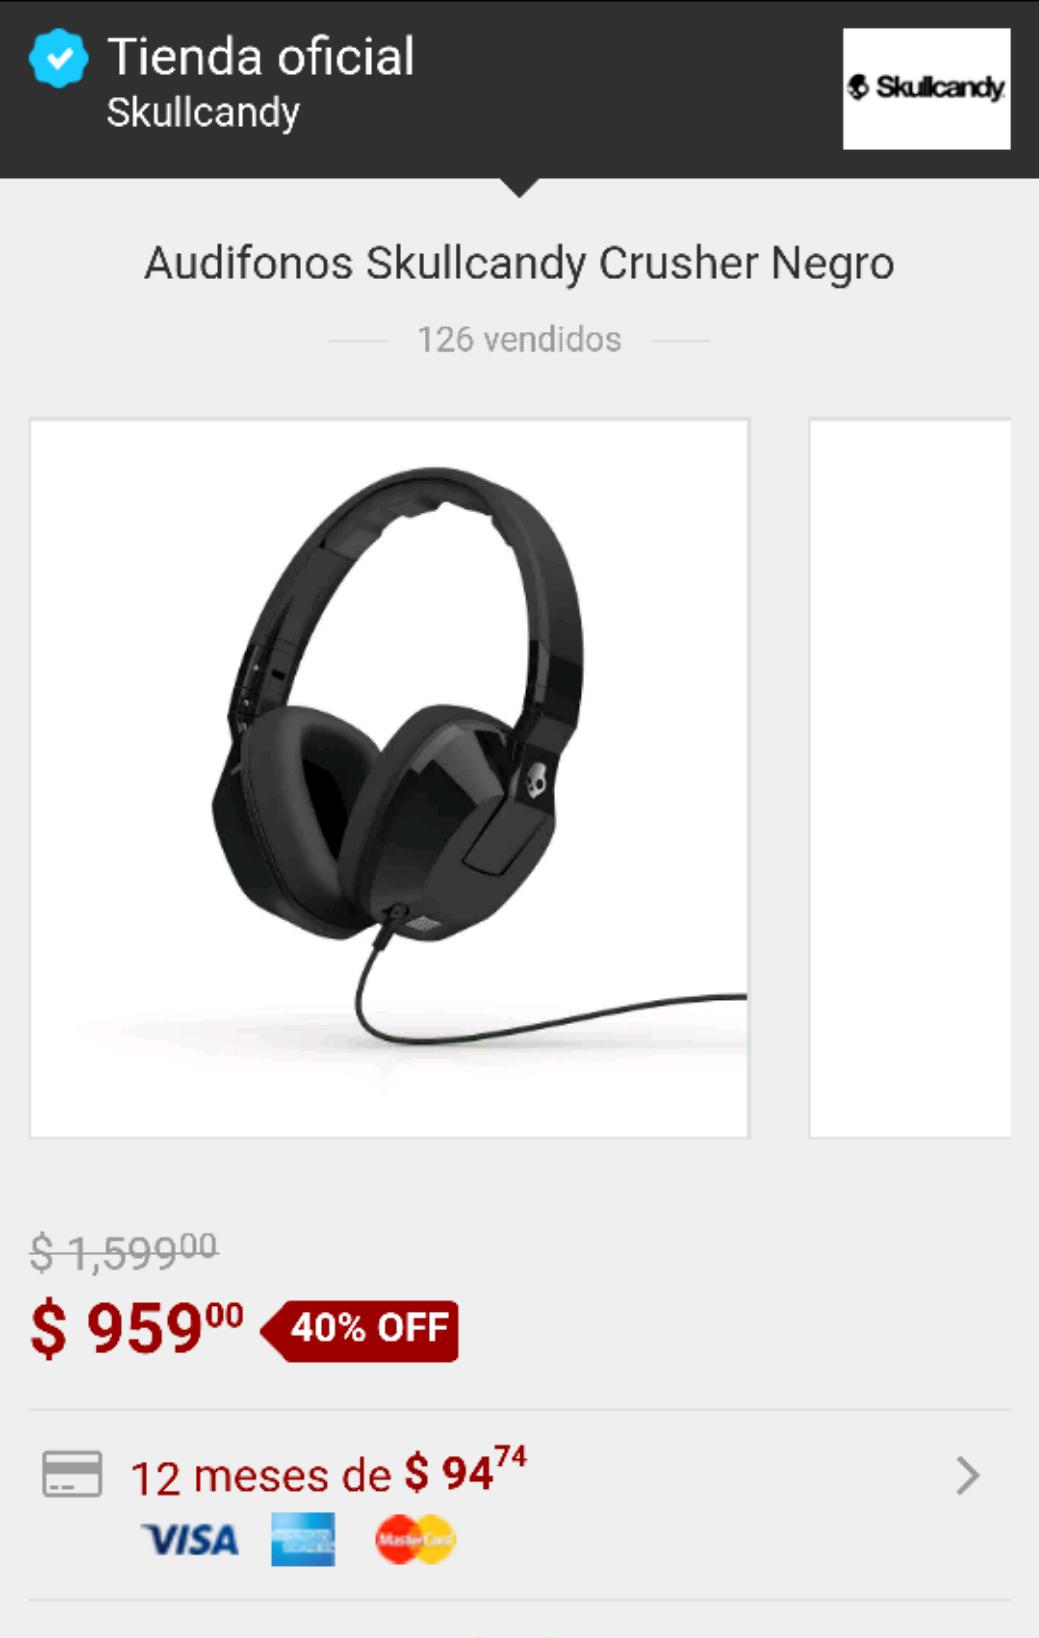 Skullcandy en Mercadolibre: Audifonos Skullcandy Crusher a $959